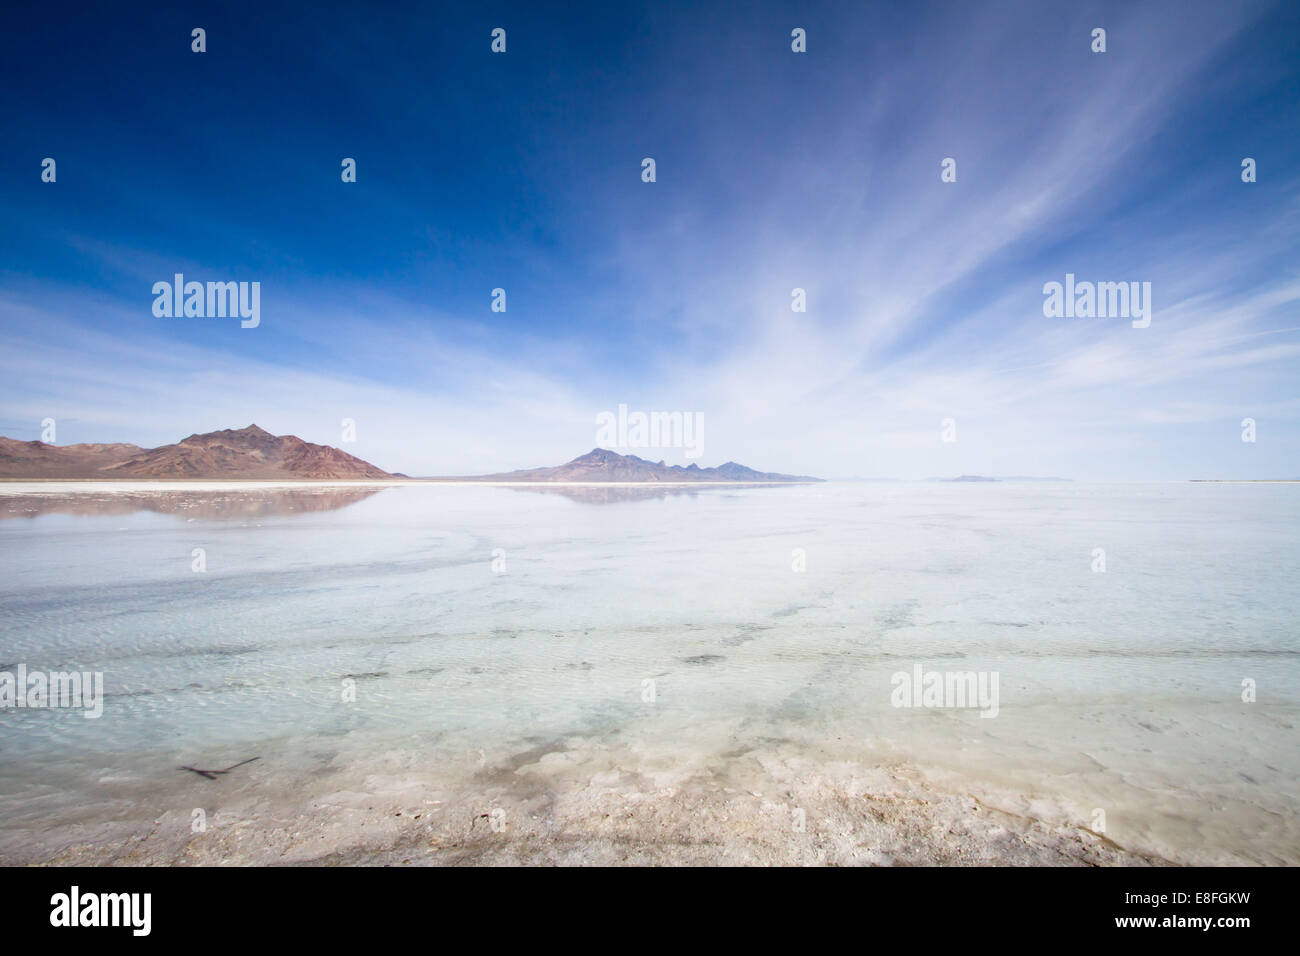 Great Salt lake, Salt Lake City, Utah, America, USA - Stock Image